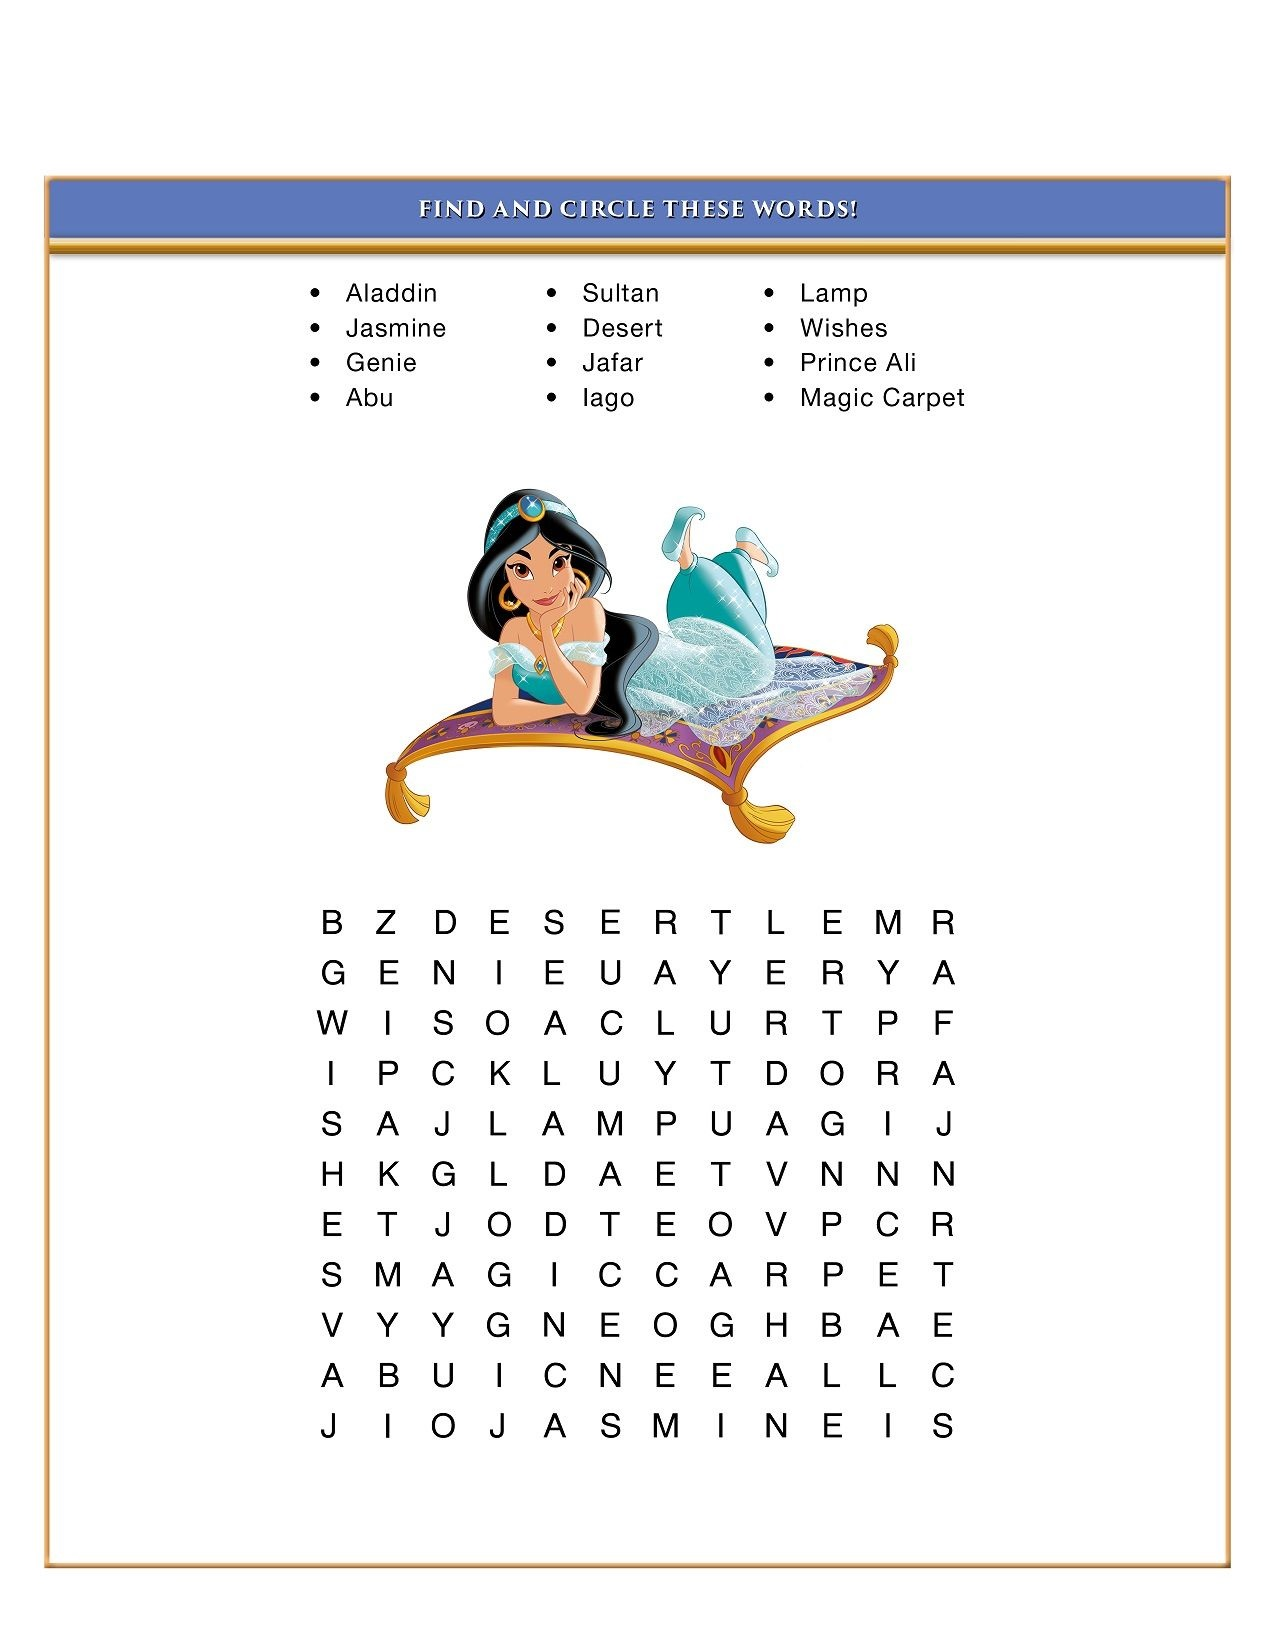 Disney Word Search Puzzles Aladdin